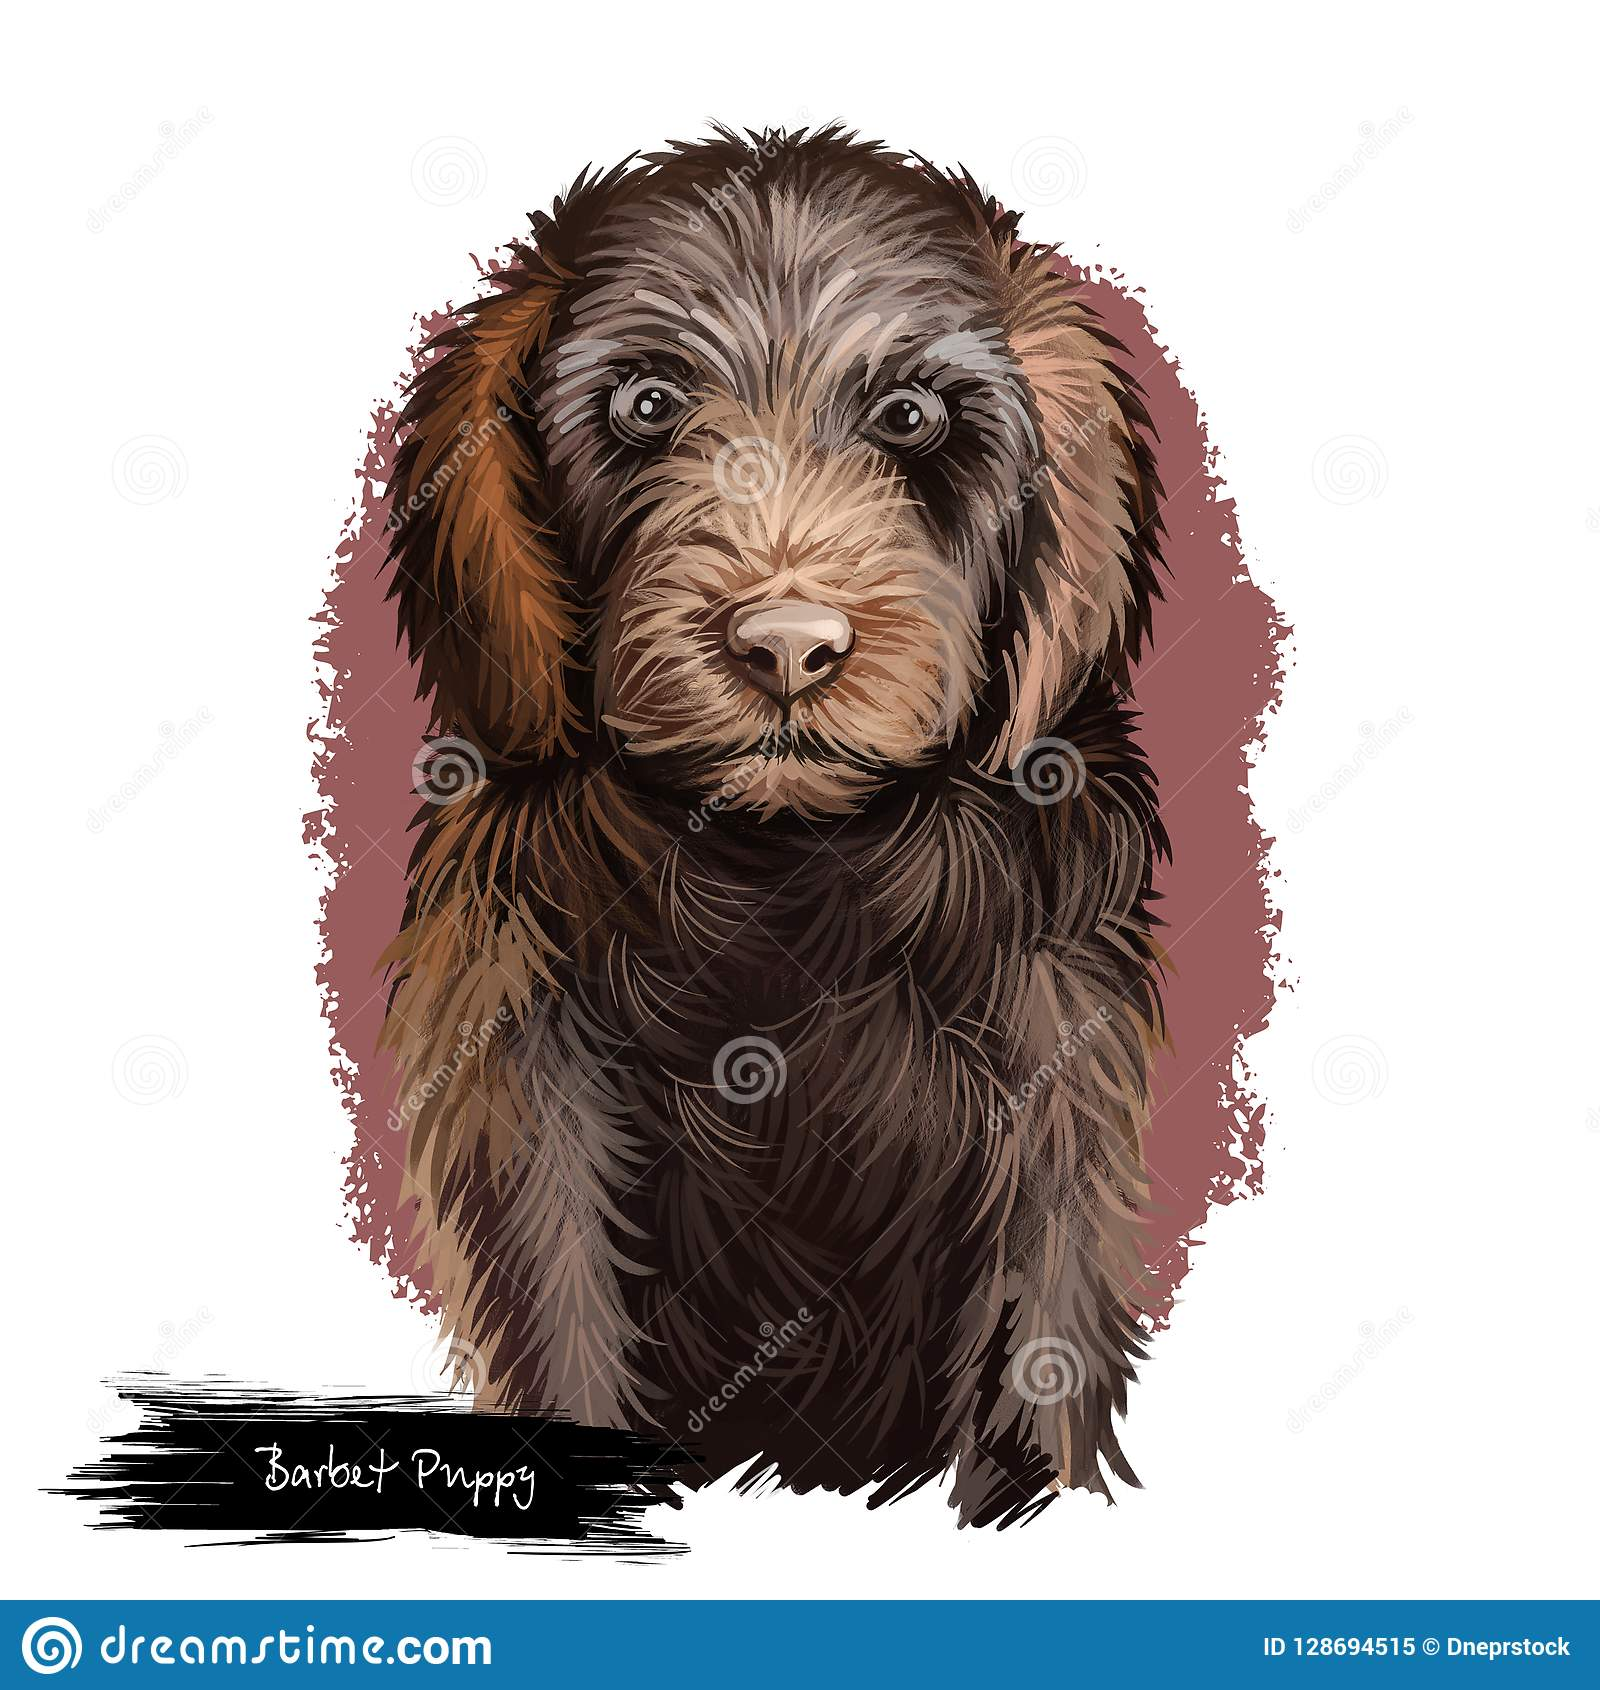 Barbet Puppy Dog Breed Digital Art Illustration Isolated On White